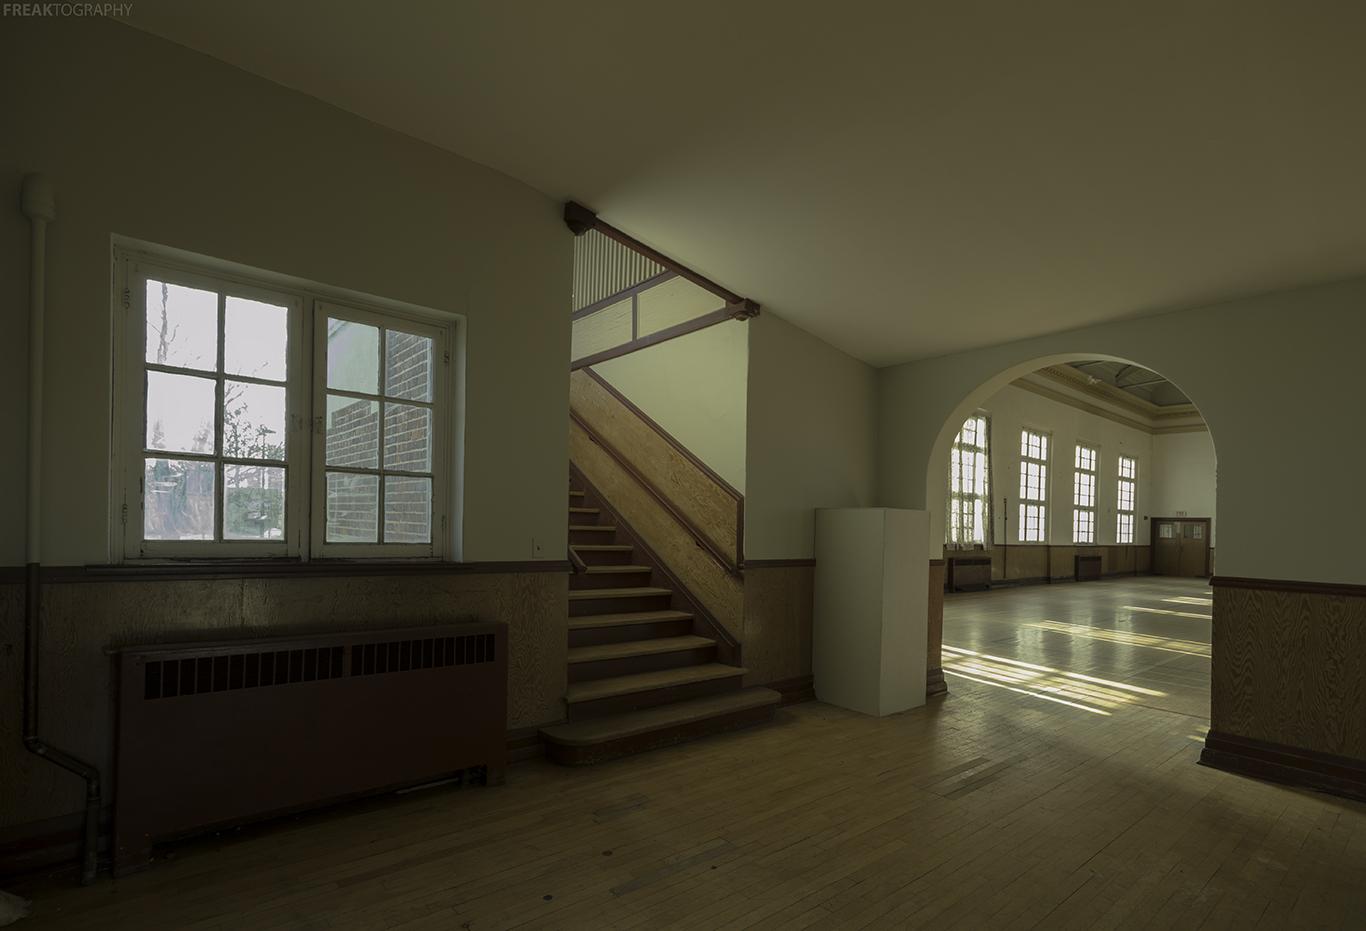 Log Cabin Floor Plans With Basement Ontario Psychiatric Hospital Abandoned Freaktography